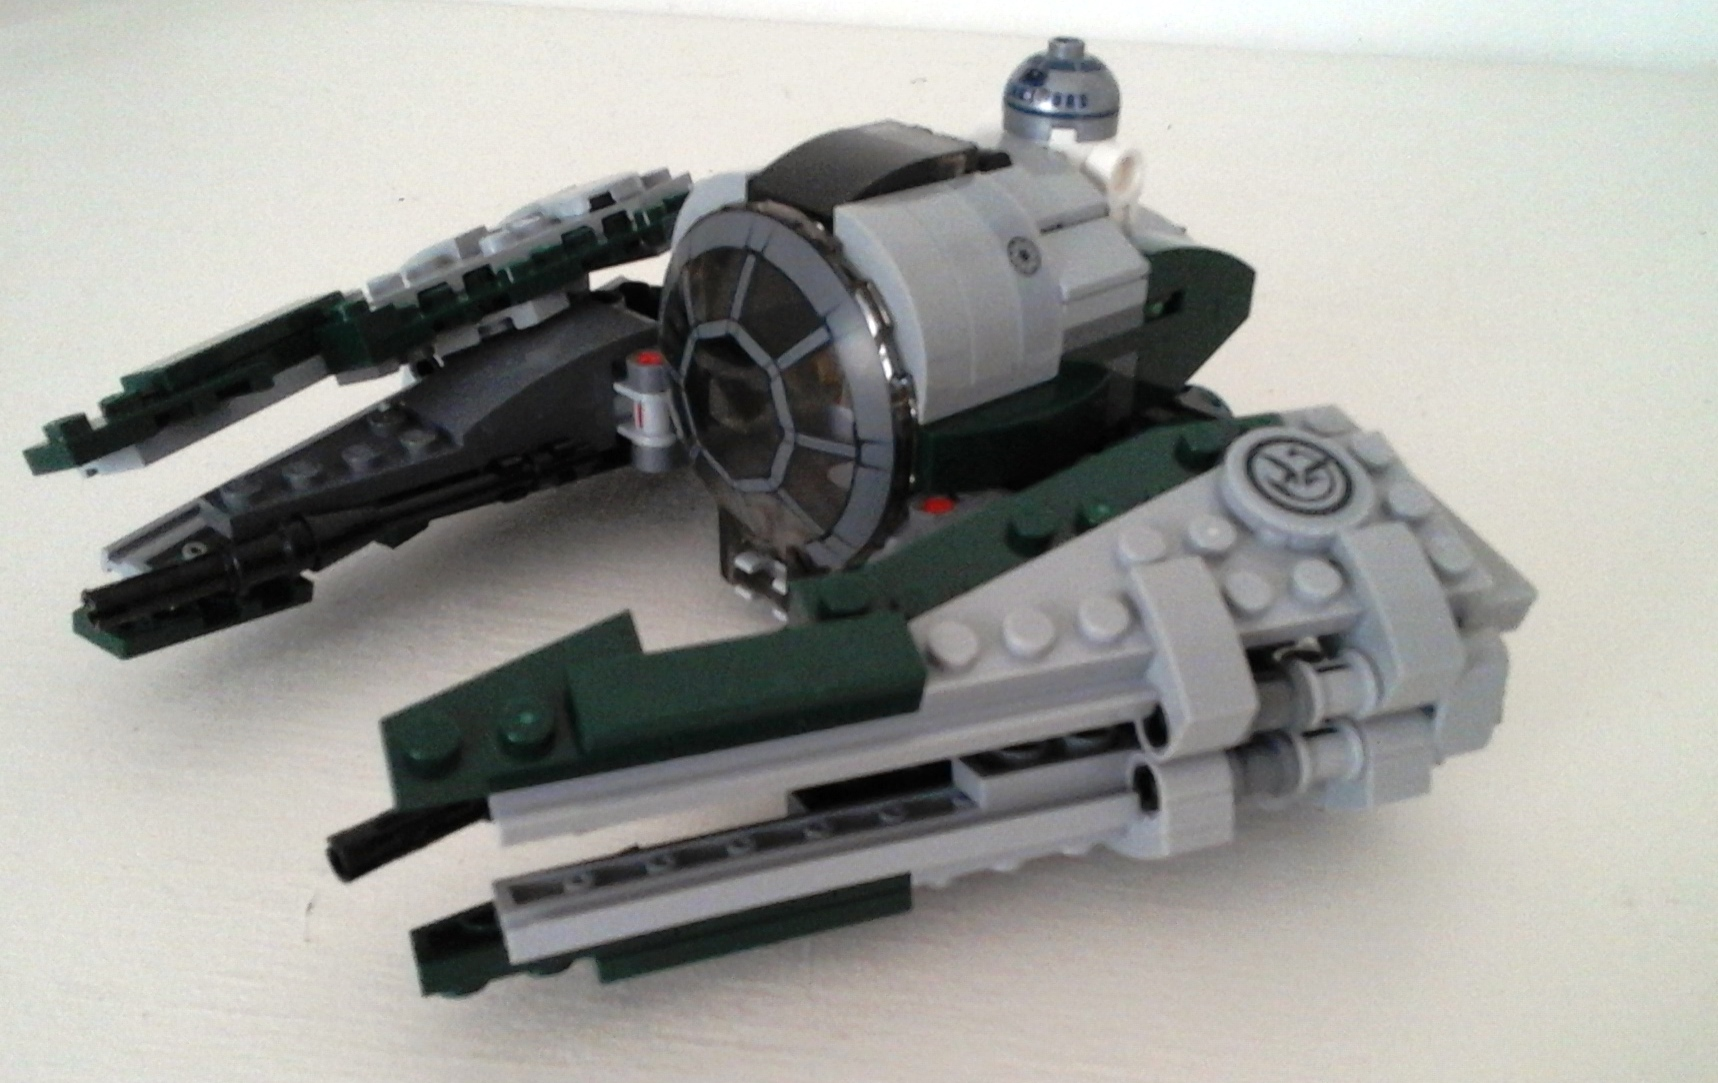 LEGO 75168 Yoda Starfighter